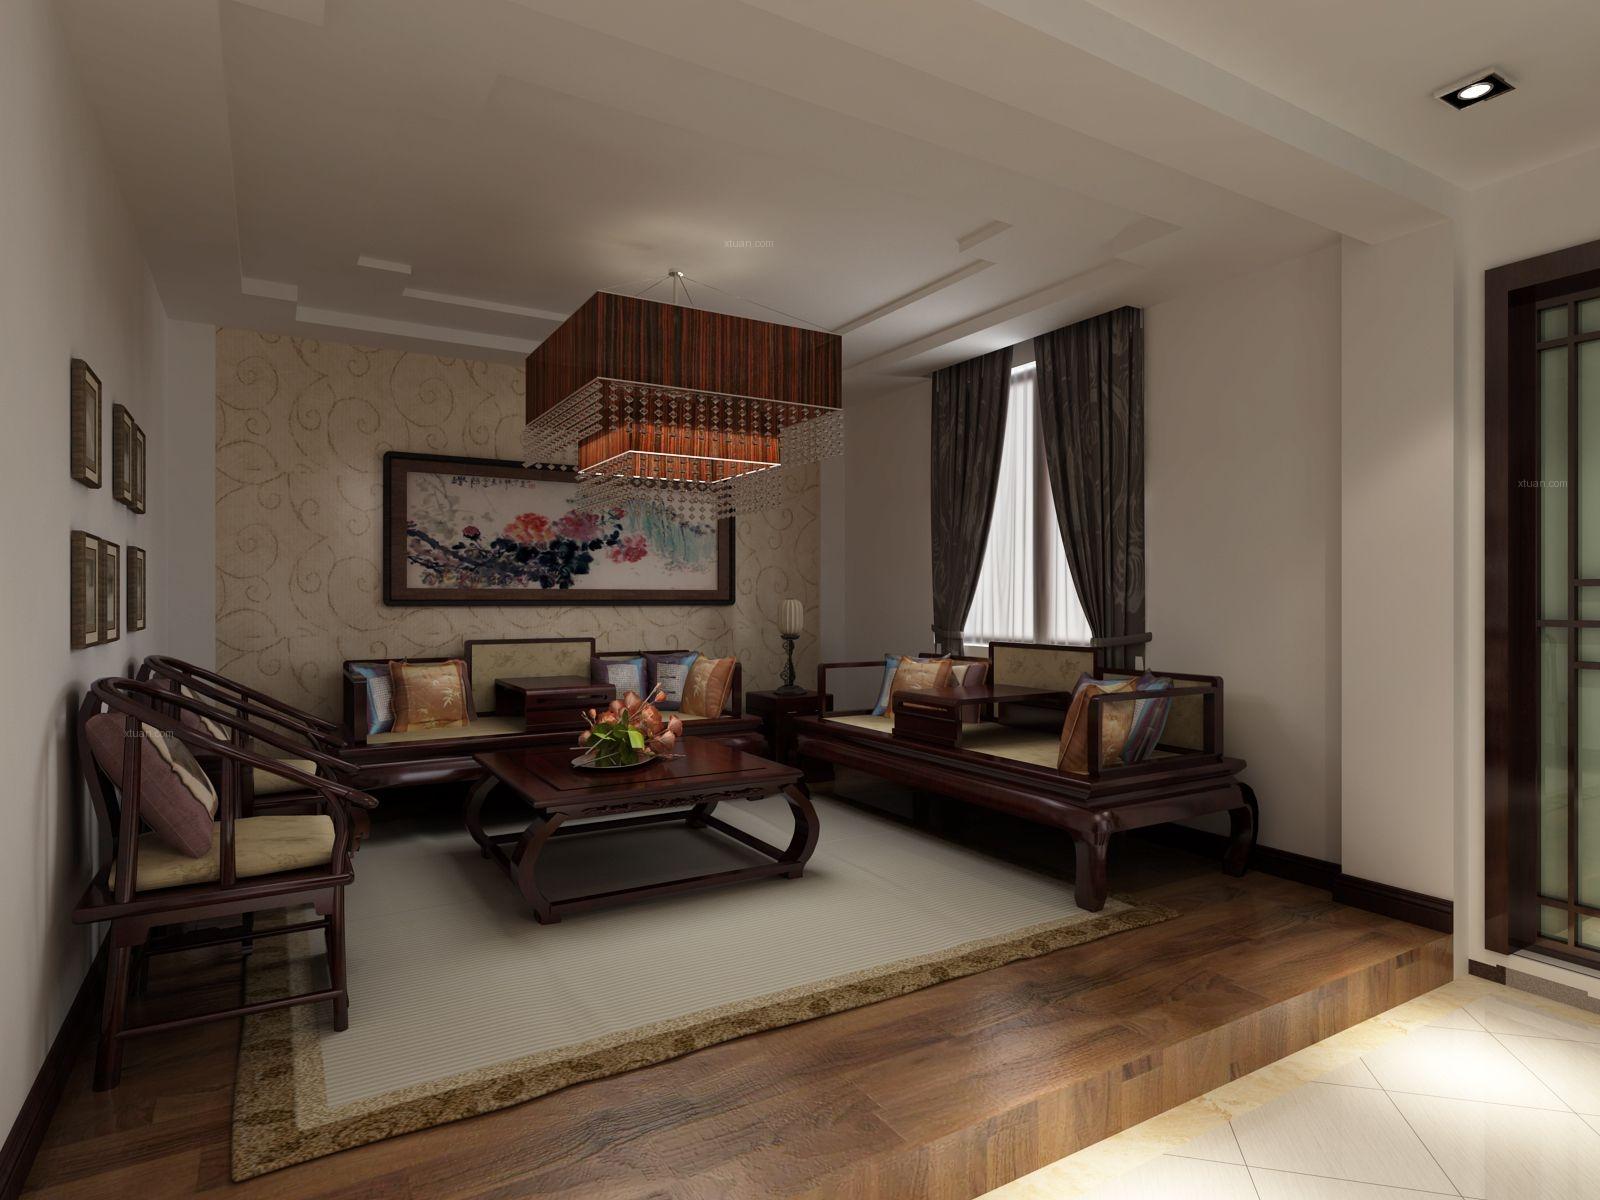 别墅中式风格客厅家庭影院